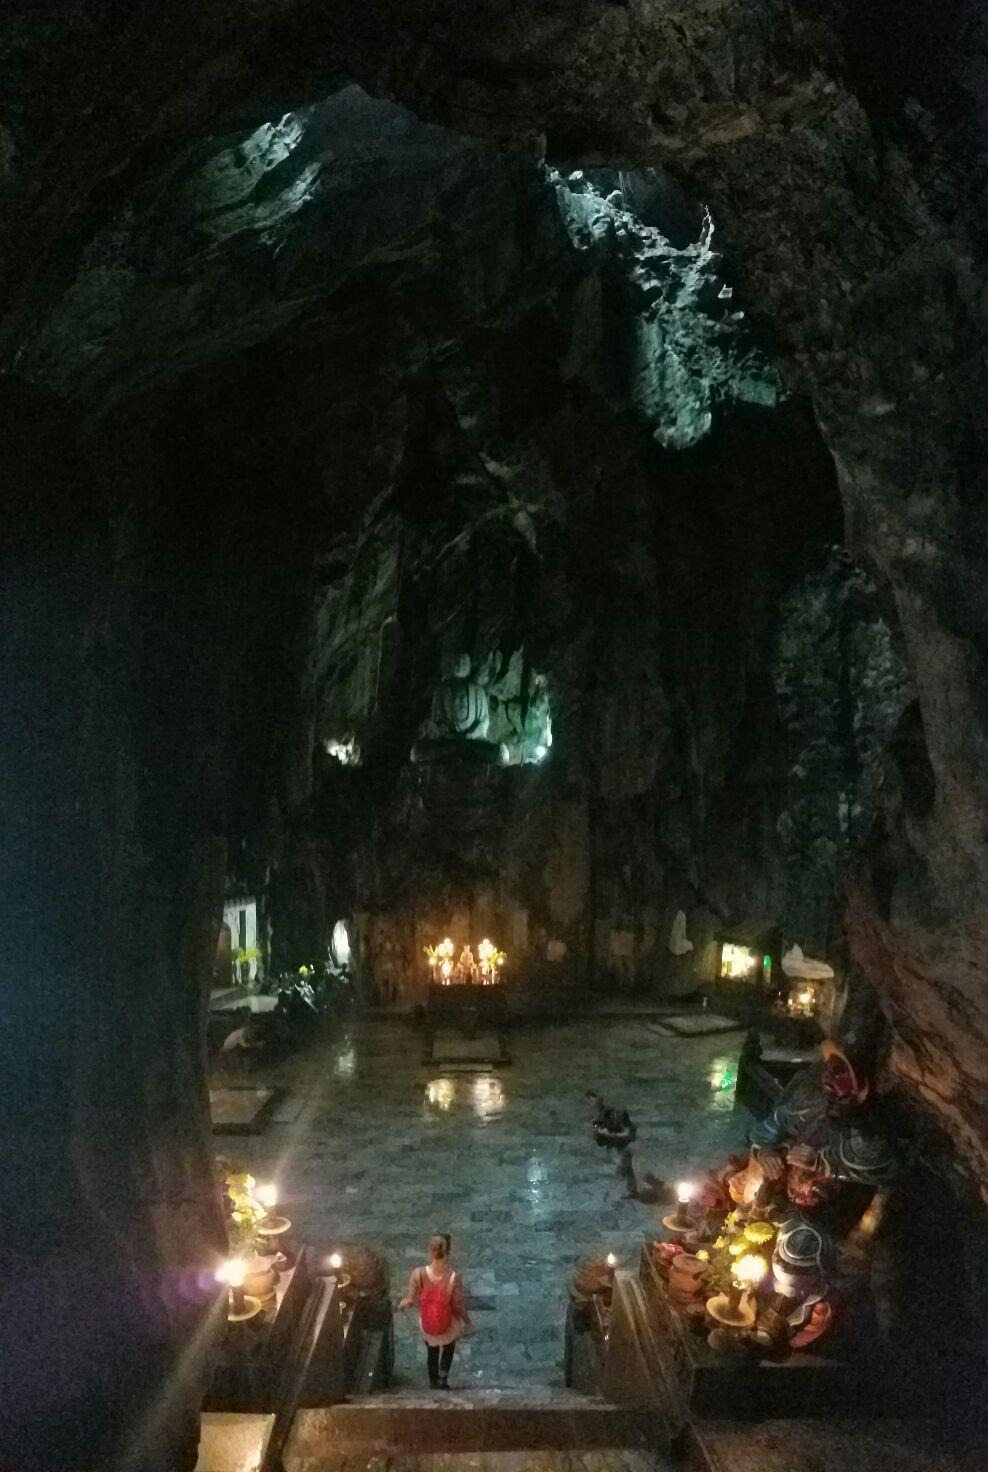 Big cave! Big Buddha! Little Jess!